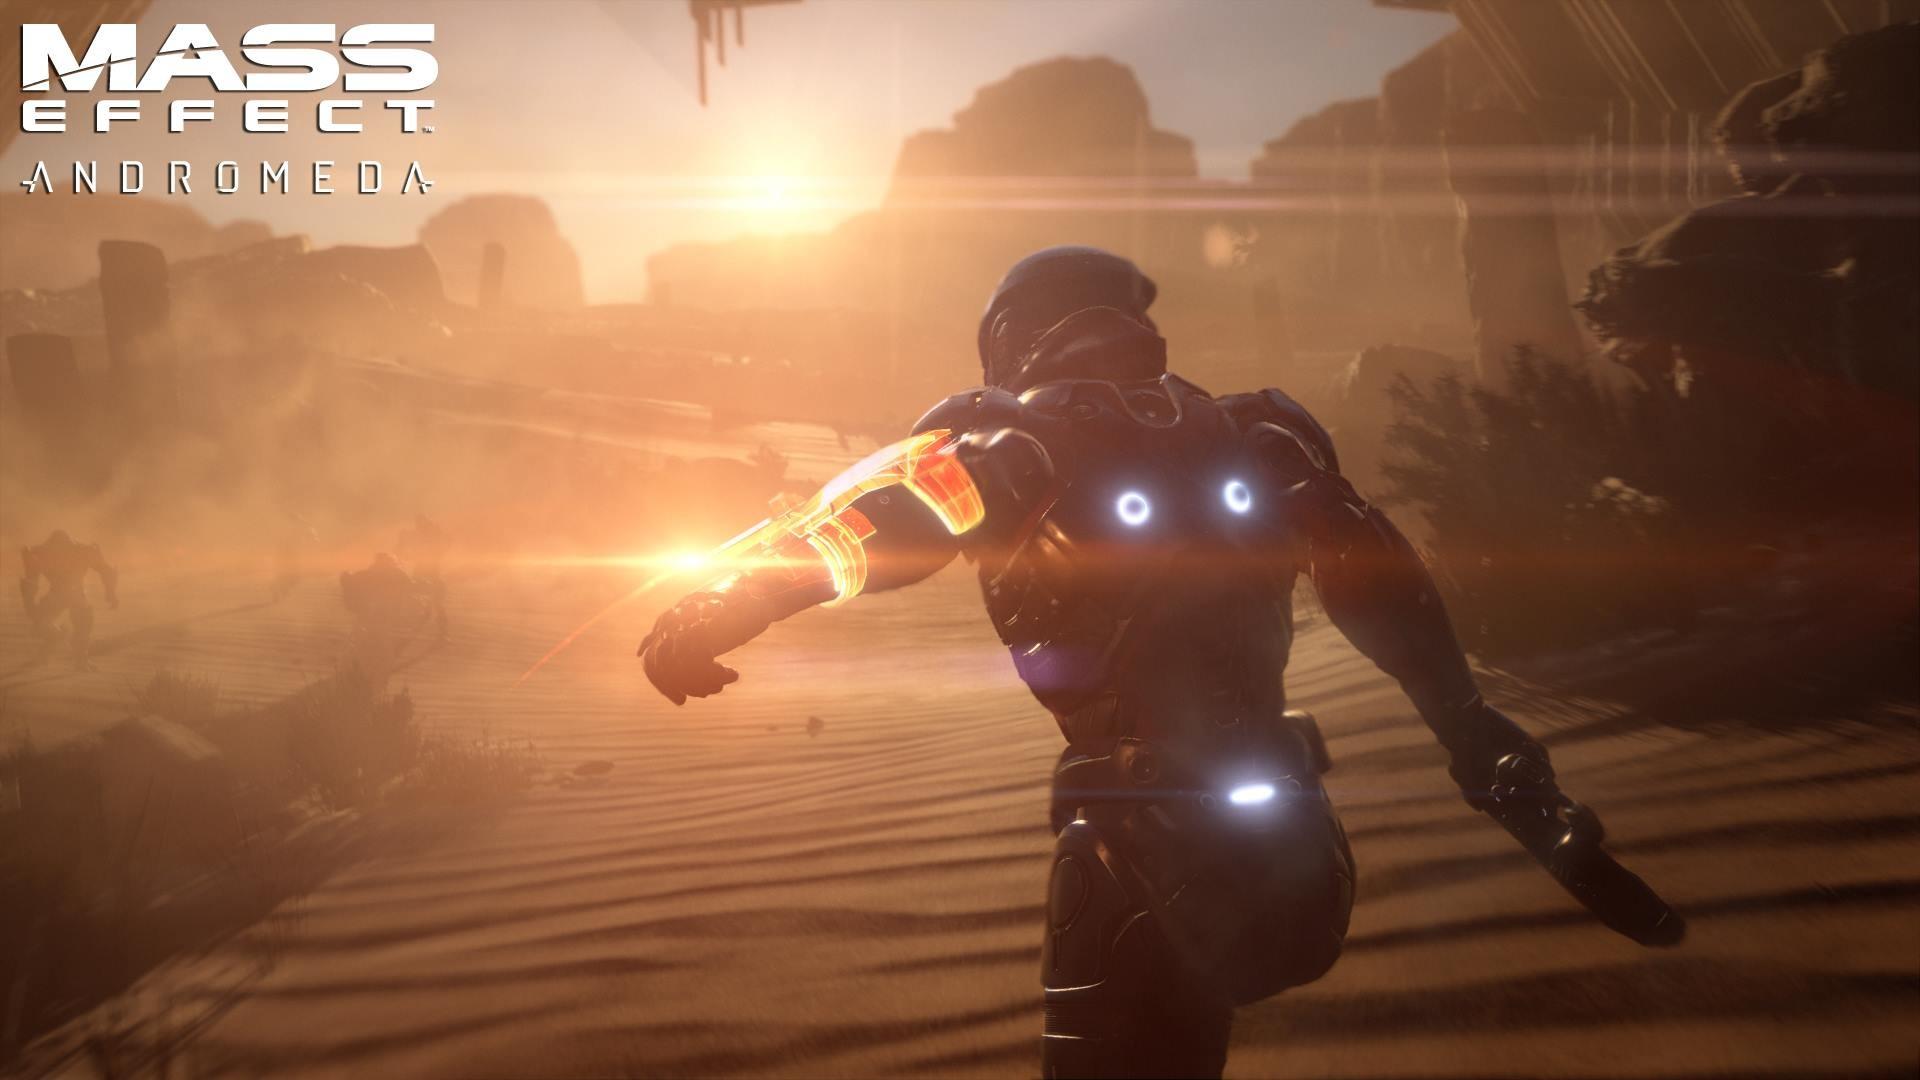 General 1920x1080 Mass Effect Mass Effect 4 Mass Effect: Andromeda